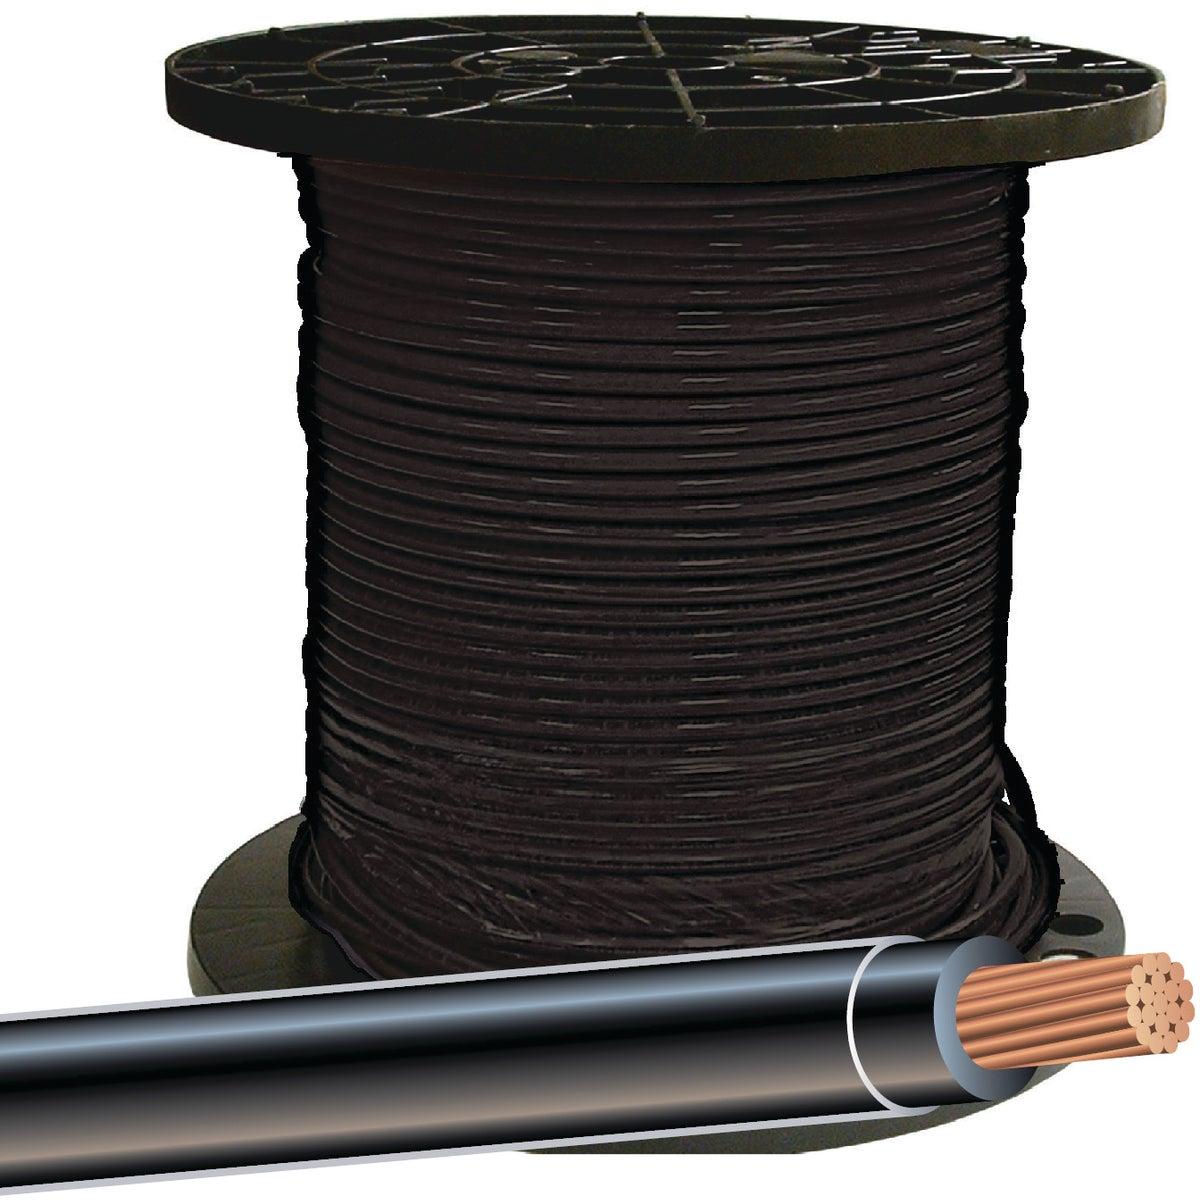 500' 8STR BLK THHN WIRE - 20488312 by Southwire Company